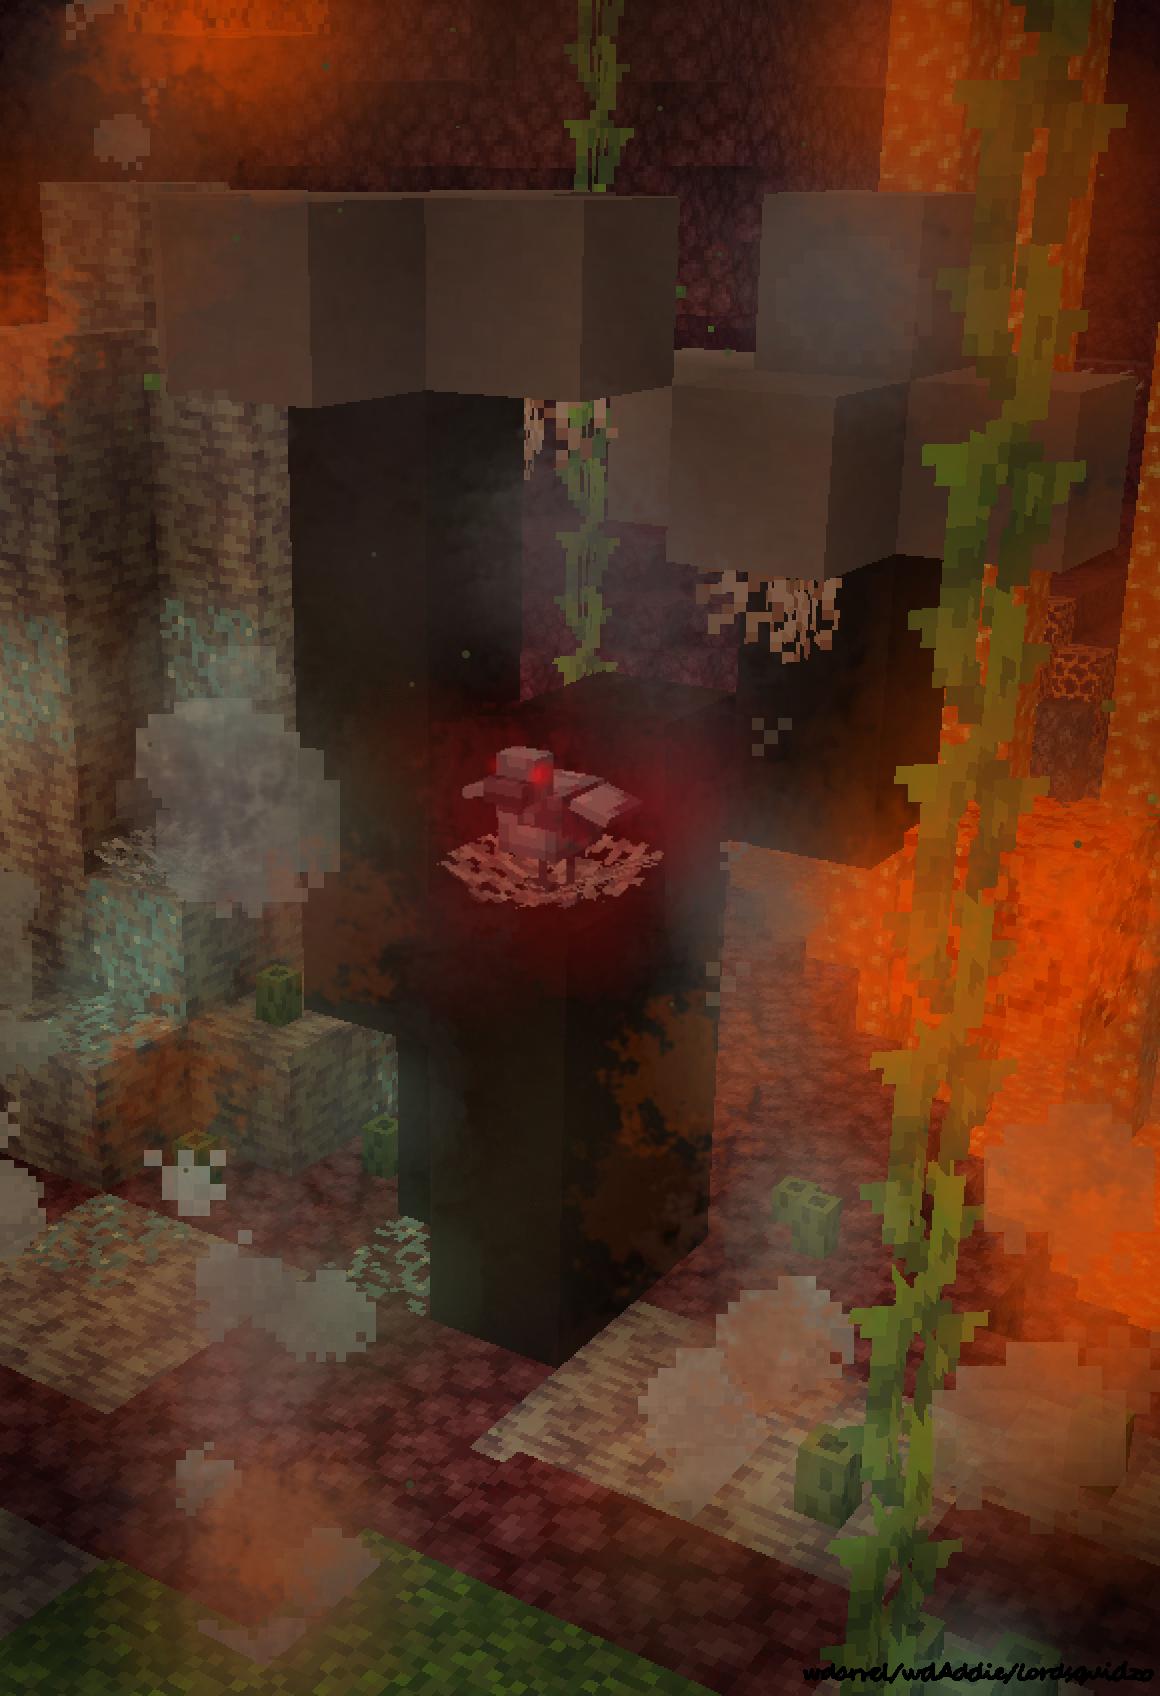 𝕕𝕚𝕟𝕠-𝕟𝕦𝕘𝕘𝕖𝕥 Minecraft Mob Skin